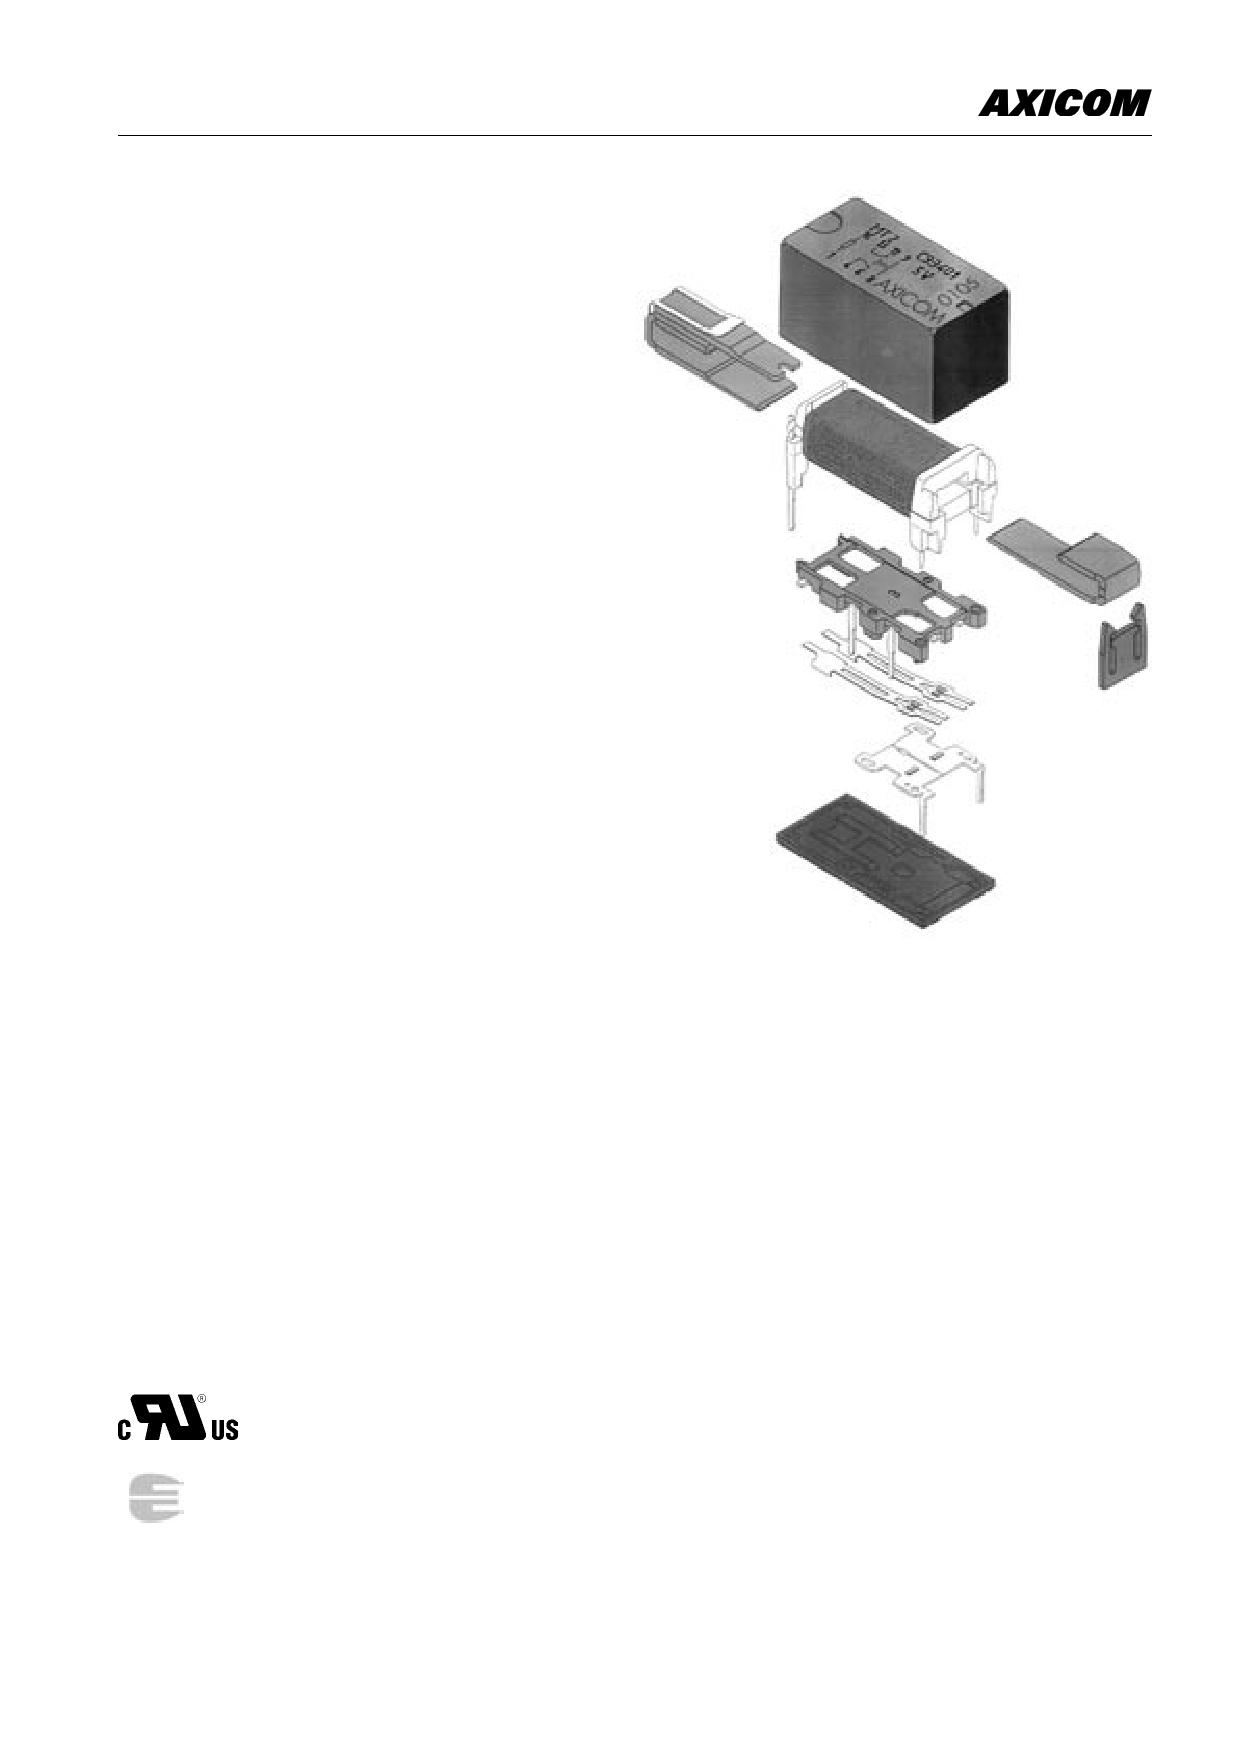 5-1462000-9 Даташит, Описание, Даташиты